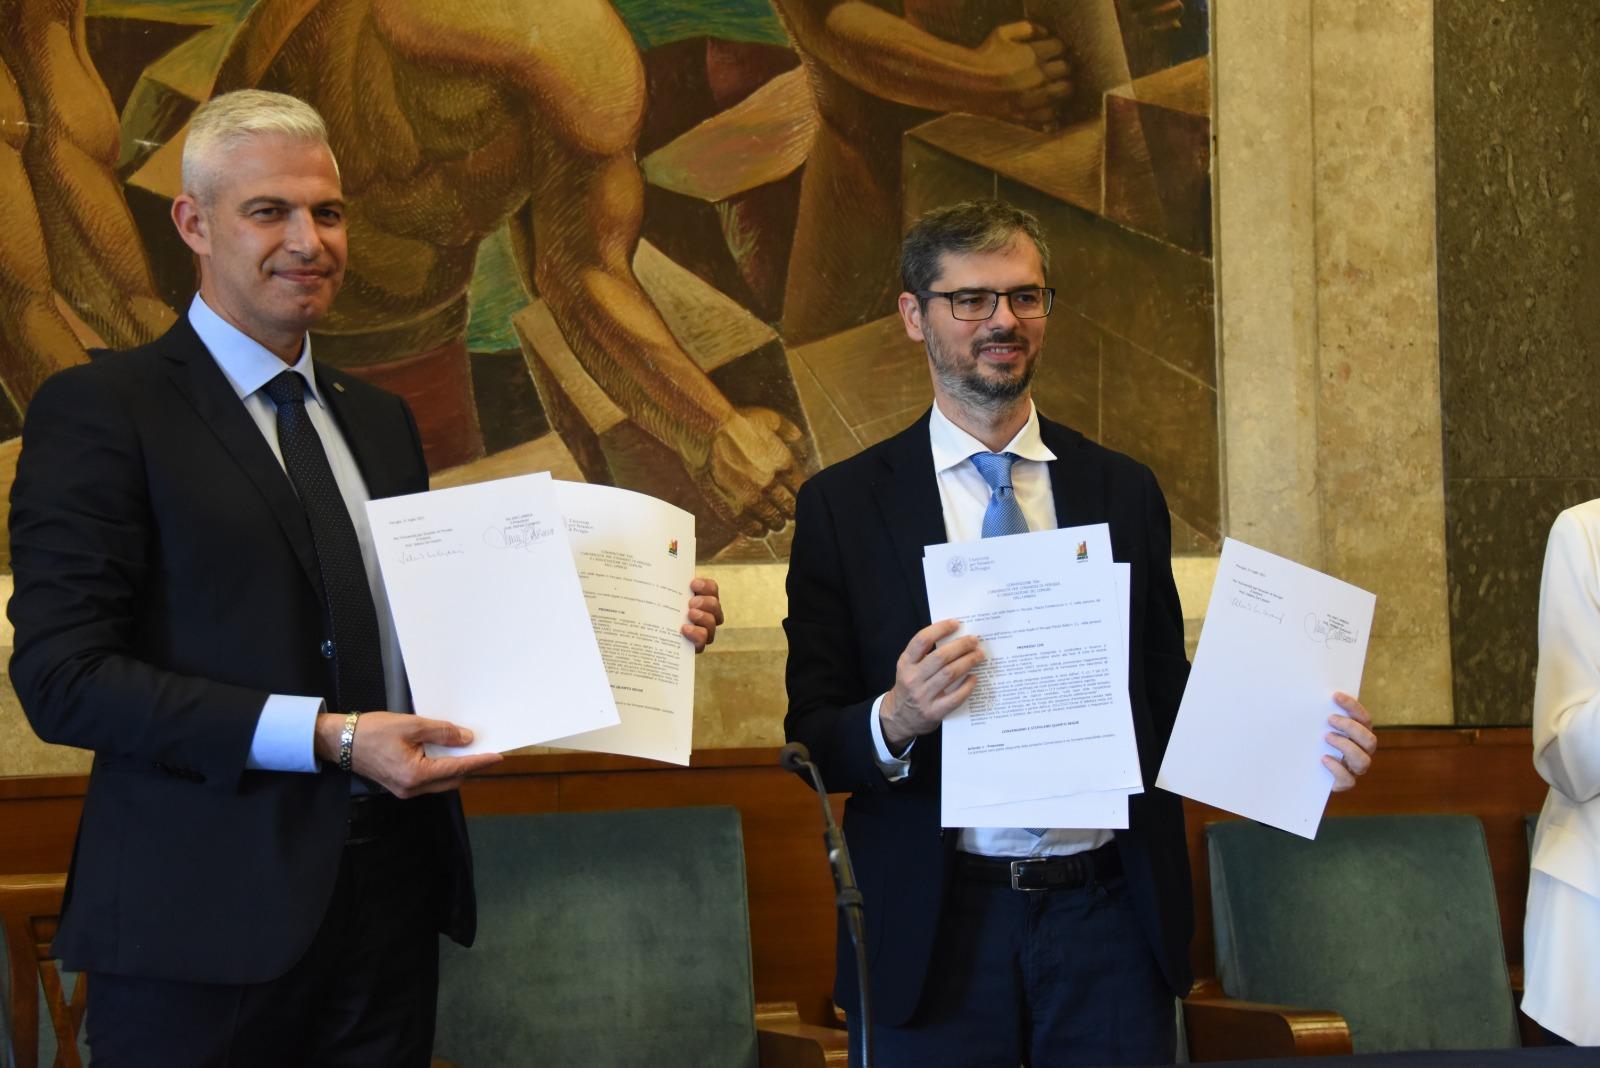 Convenzione Anci Umbria - Università per Stranieri Perugia